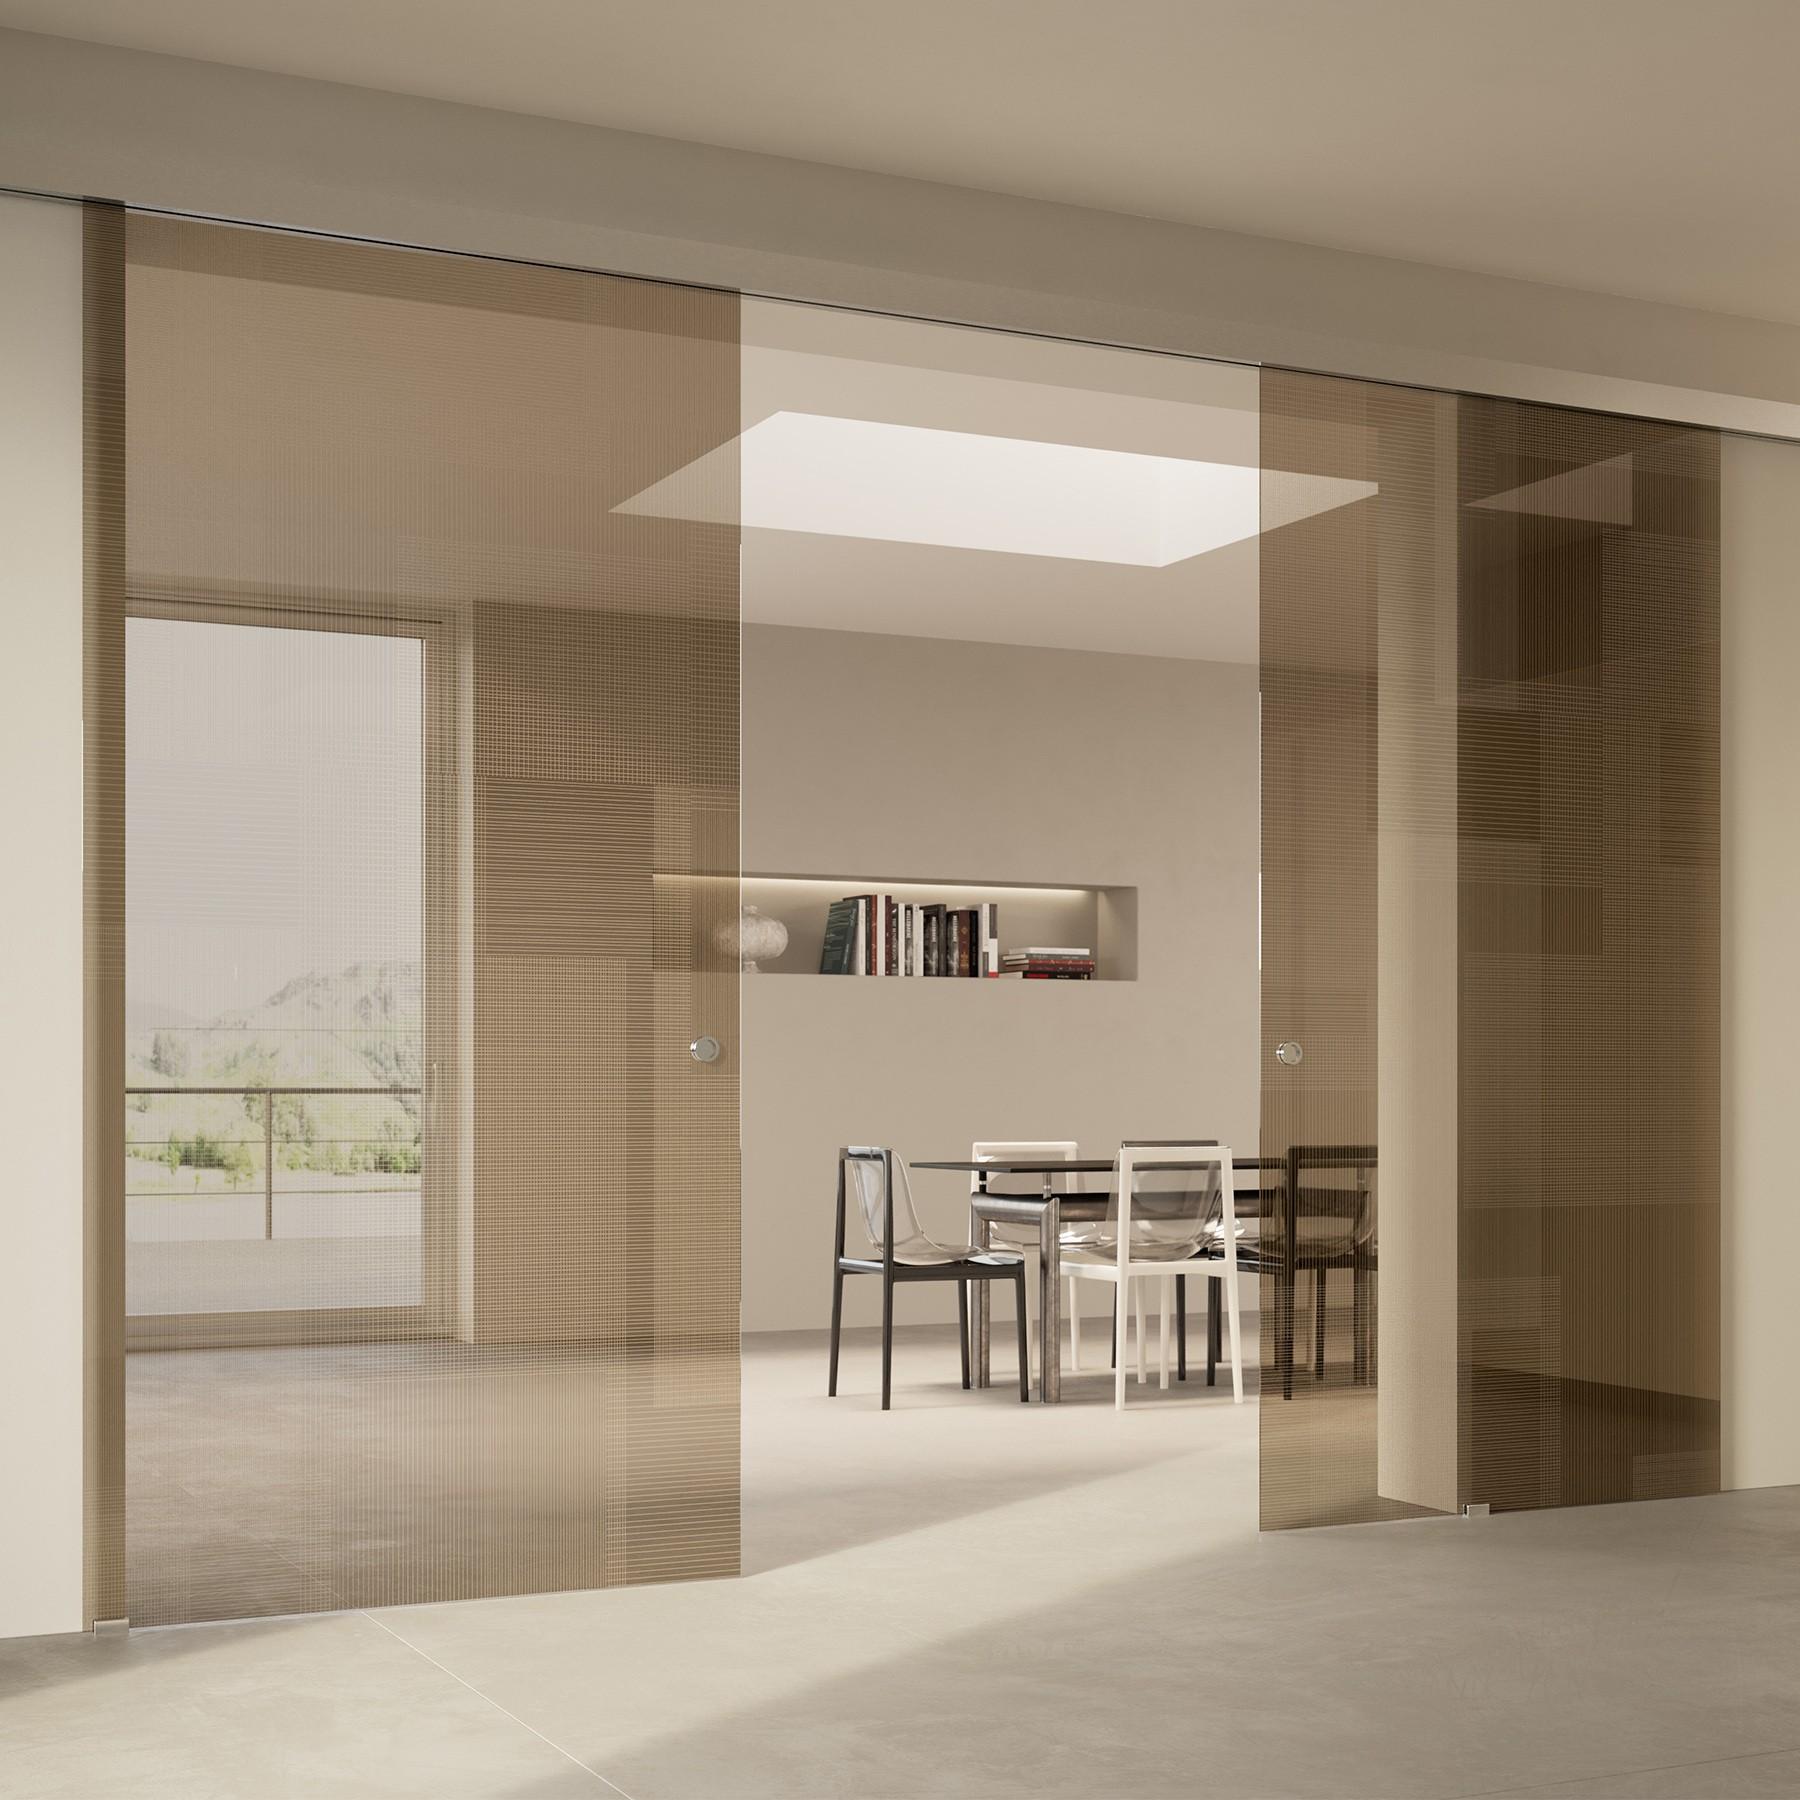 Scenario Visio with BIT 03 trasparente bronzo glass